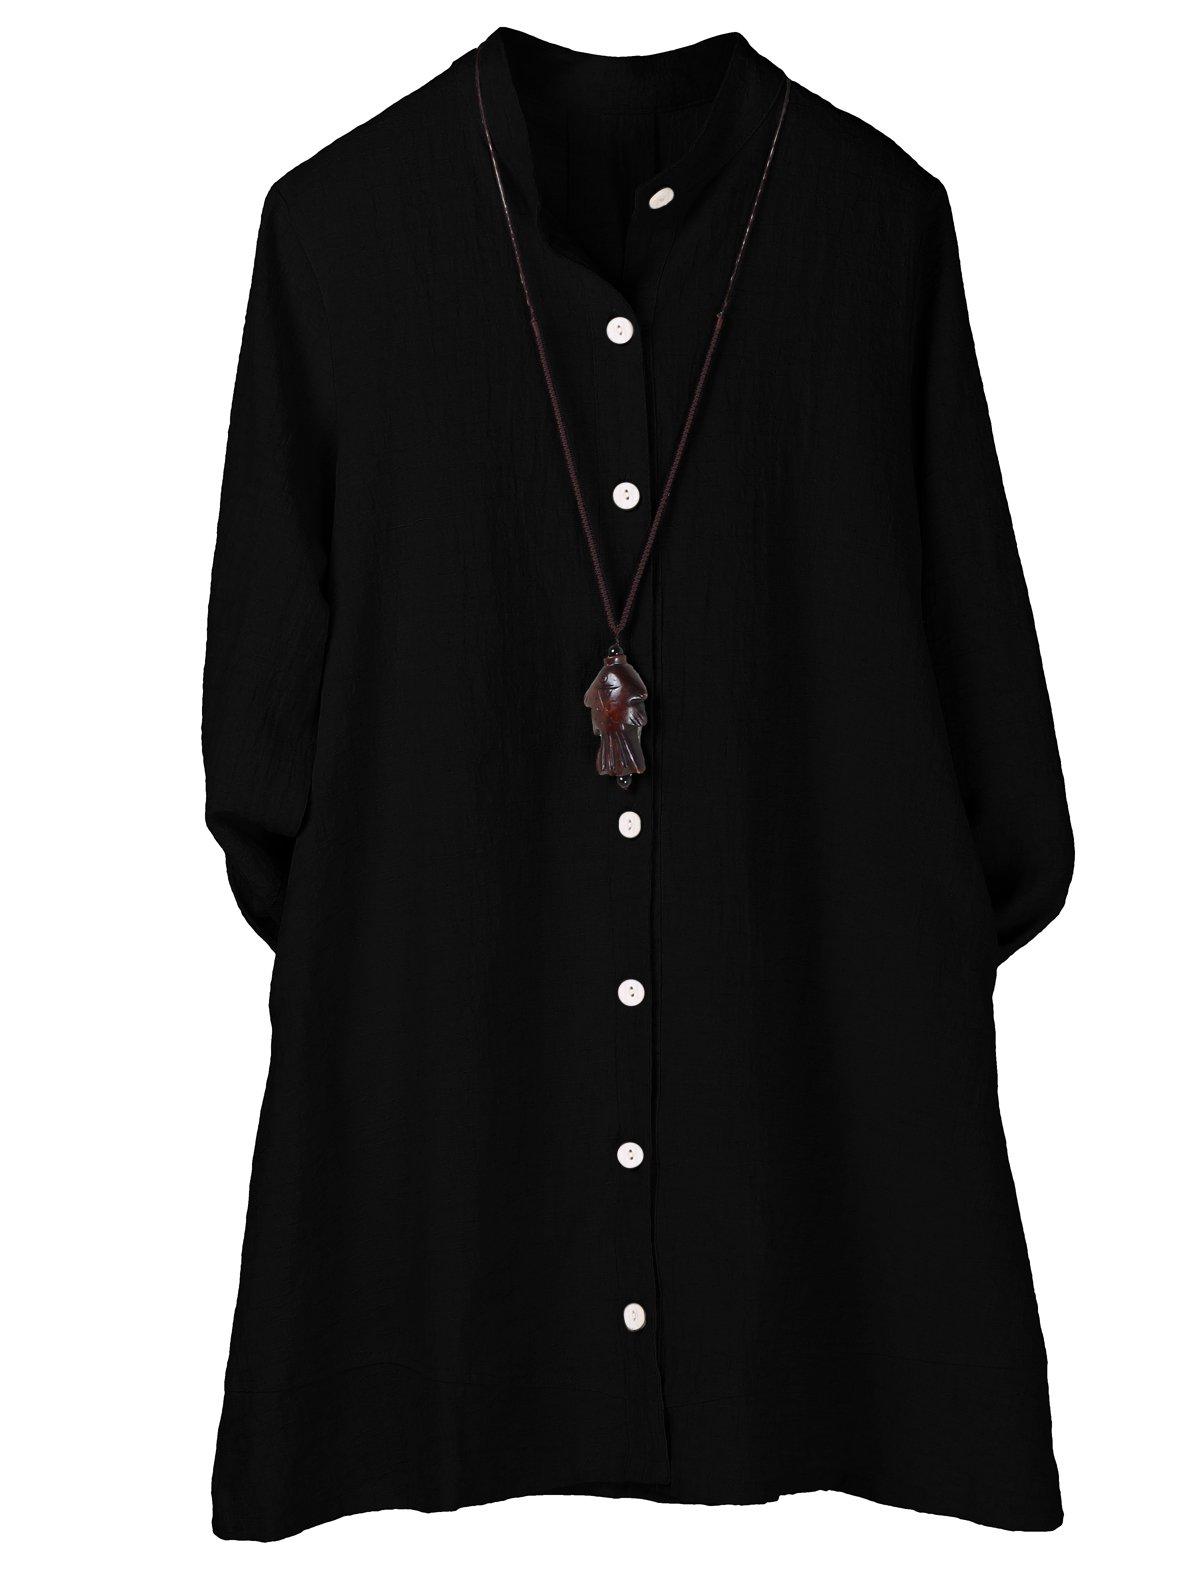 Minibee Women's Button Down Jacket Long Sleeve Jacquard Blouses Cardigan Black L